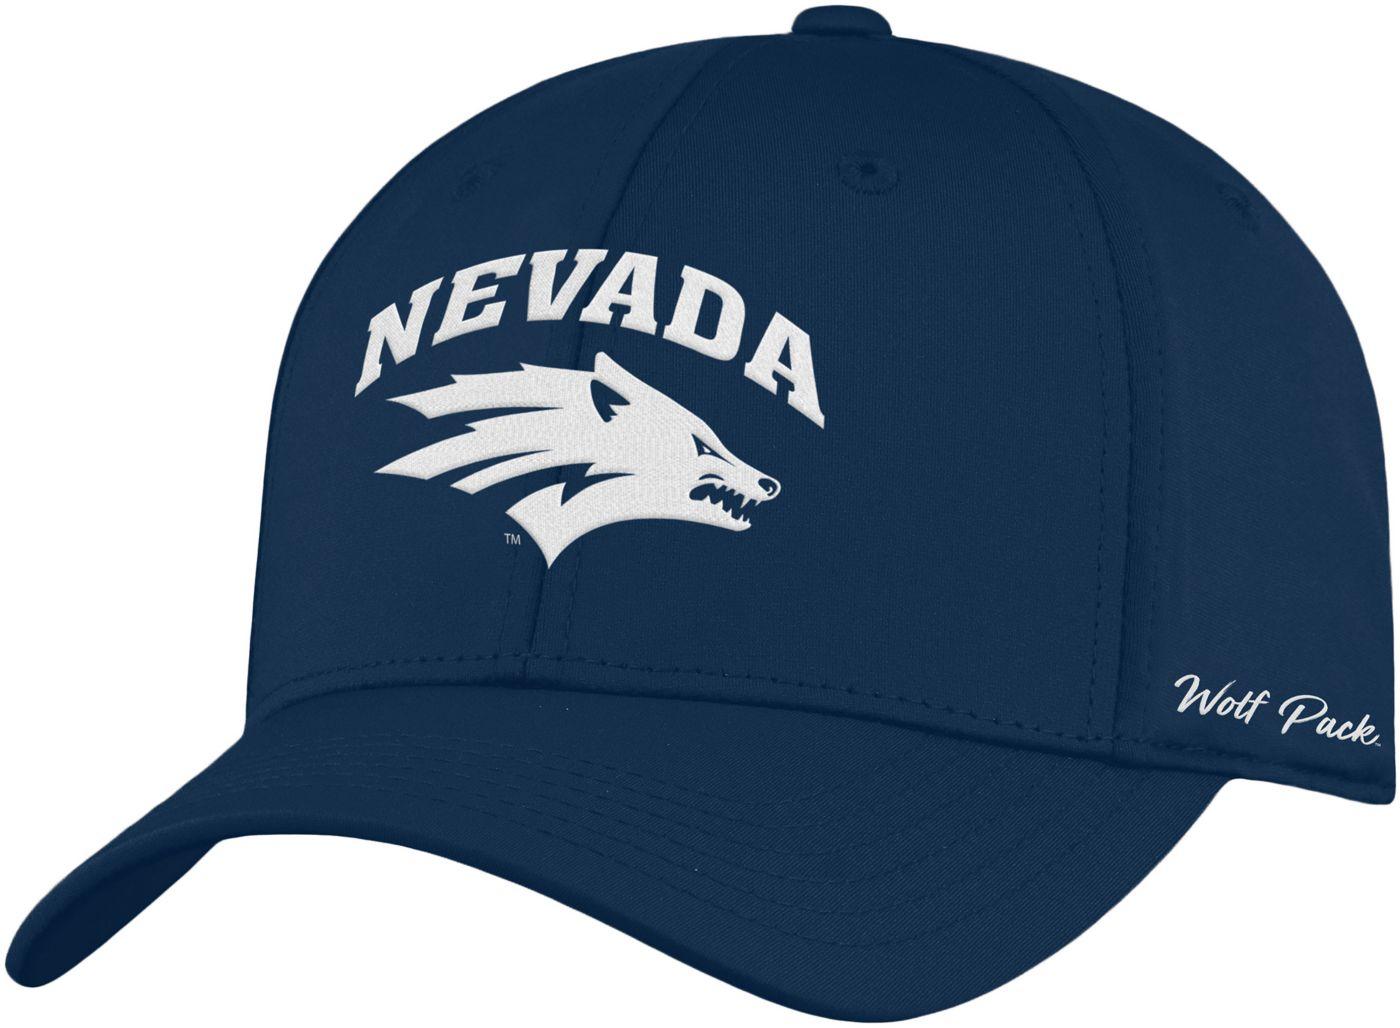 Top of the World Men's Nevada Wolf Pack Blue Phenom 1Fit Flex Hat